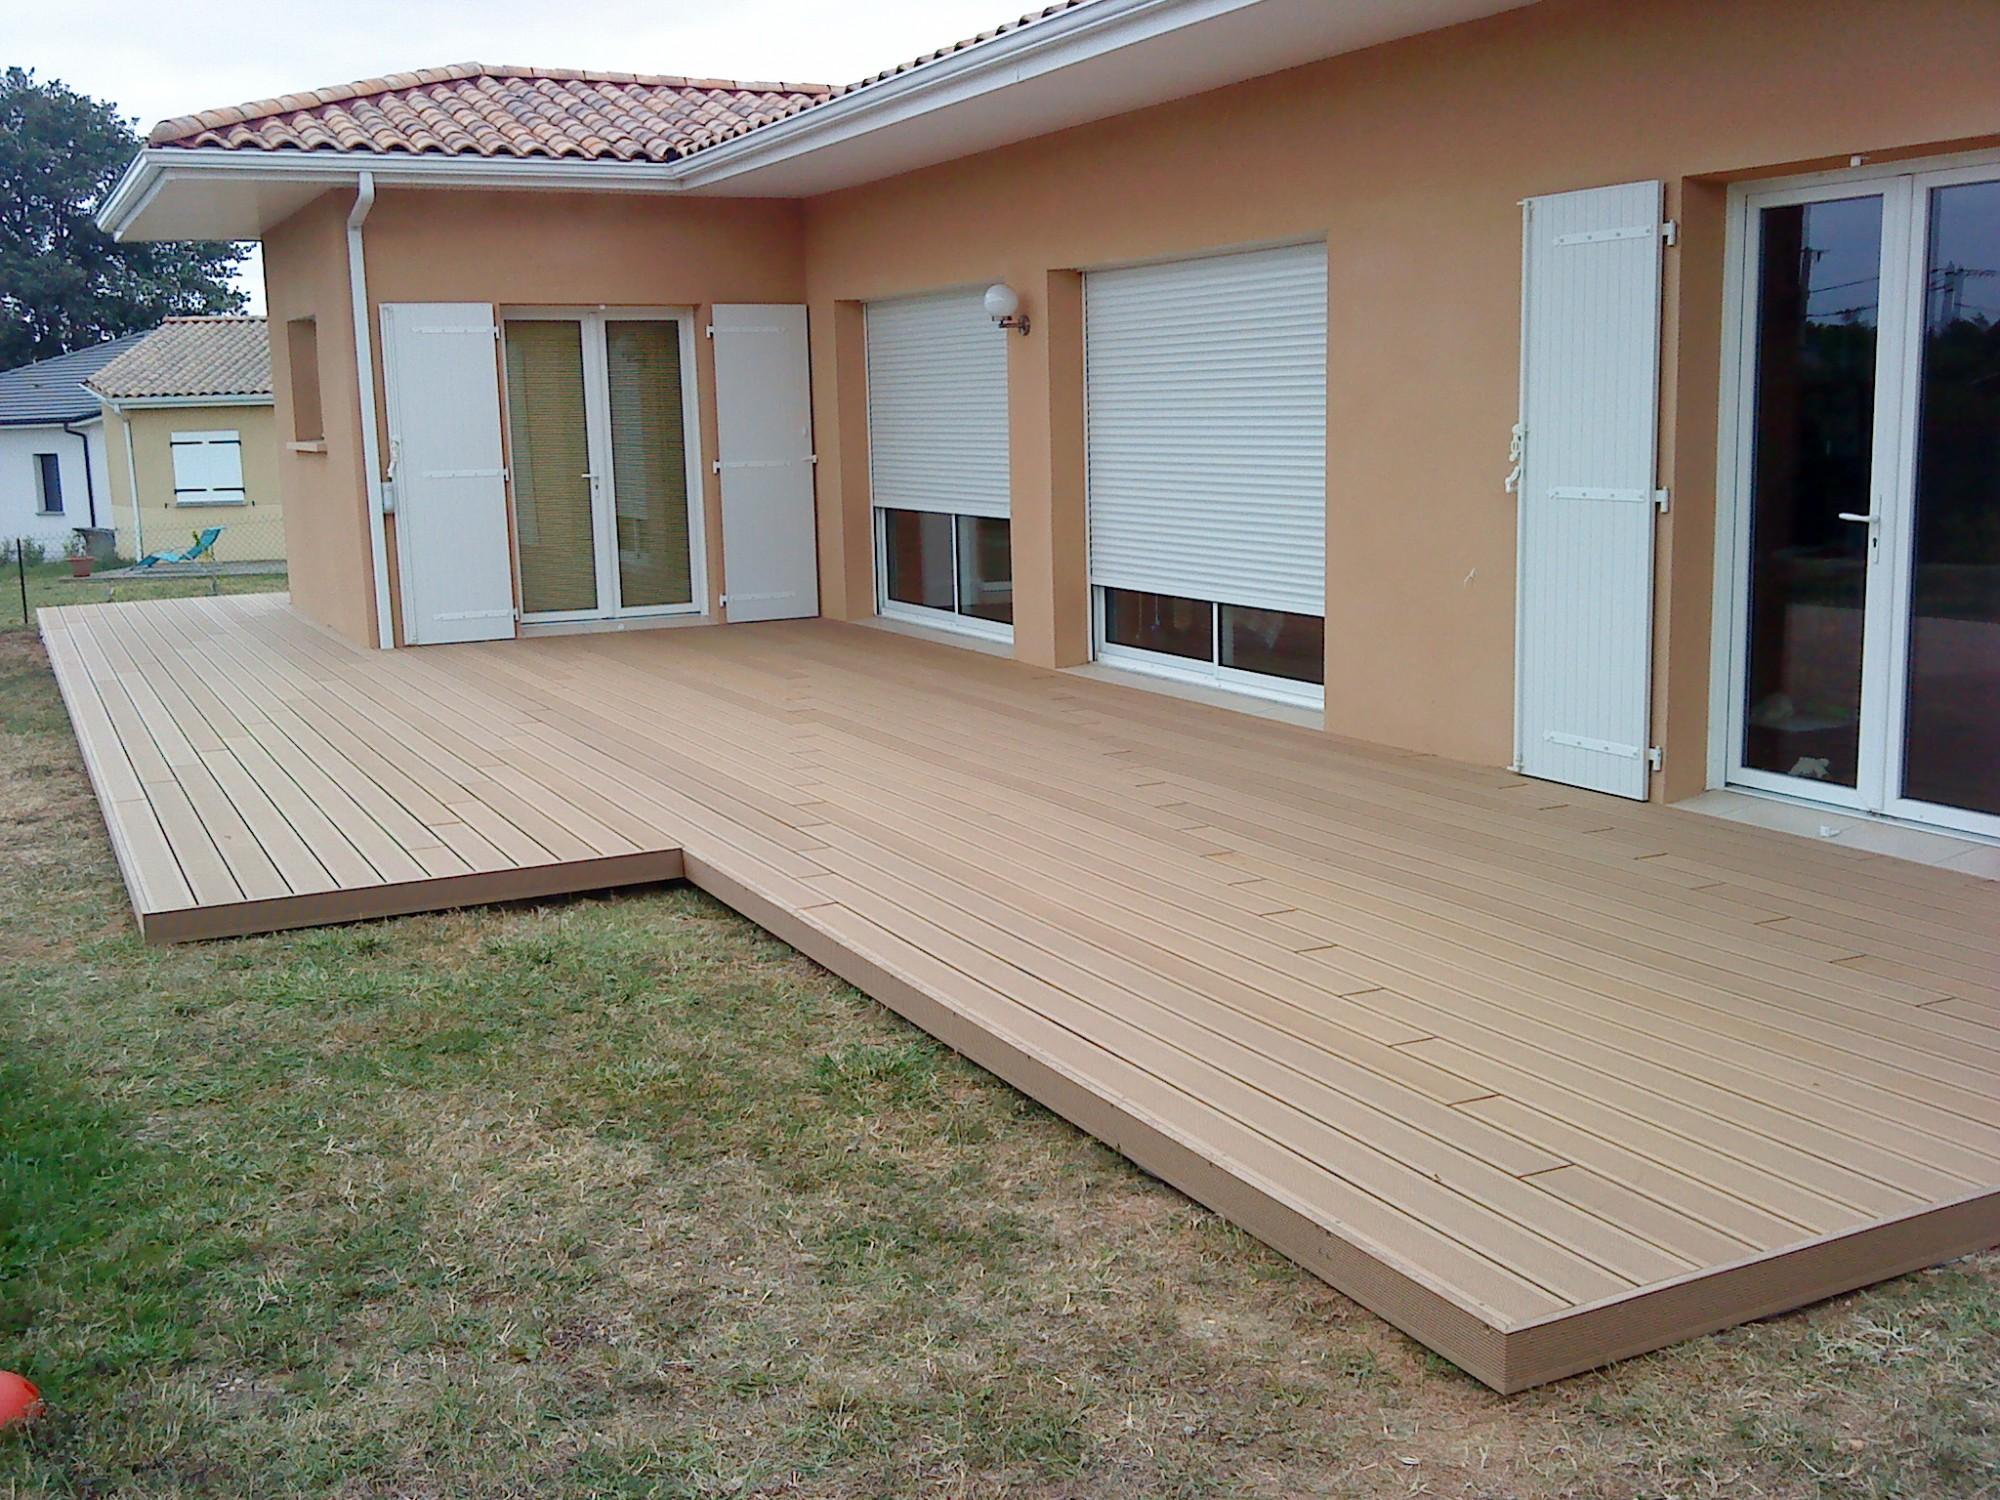 terrasse exterieur sur terre veranda. Black Bedroom Furniture Sets. Home Design Ideas